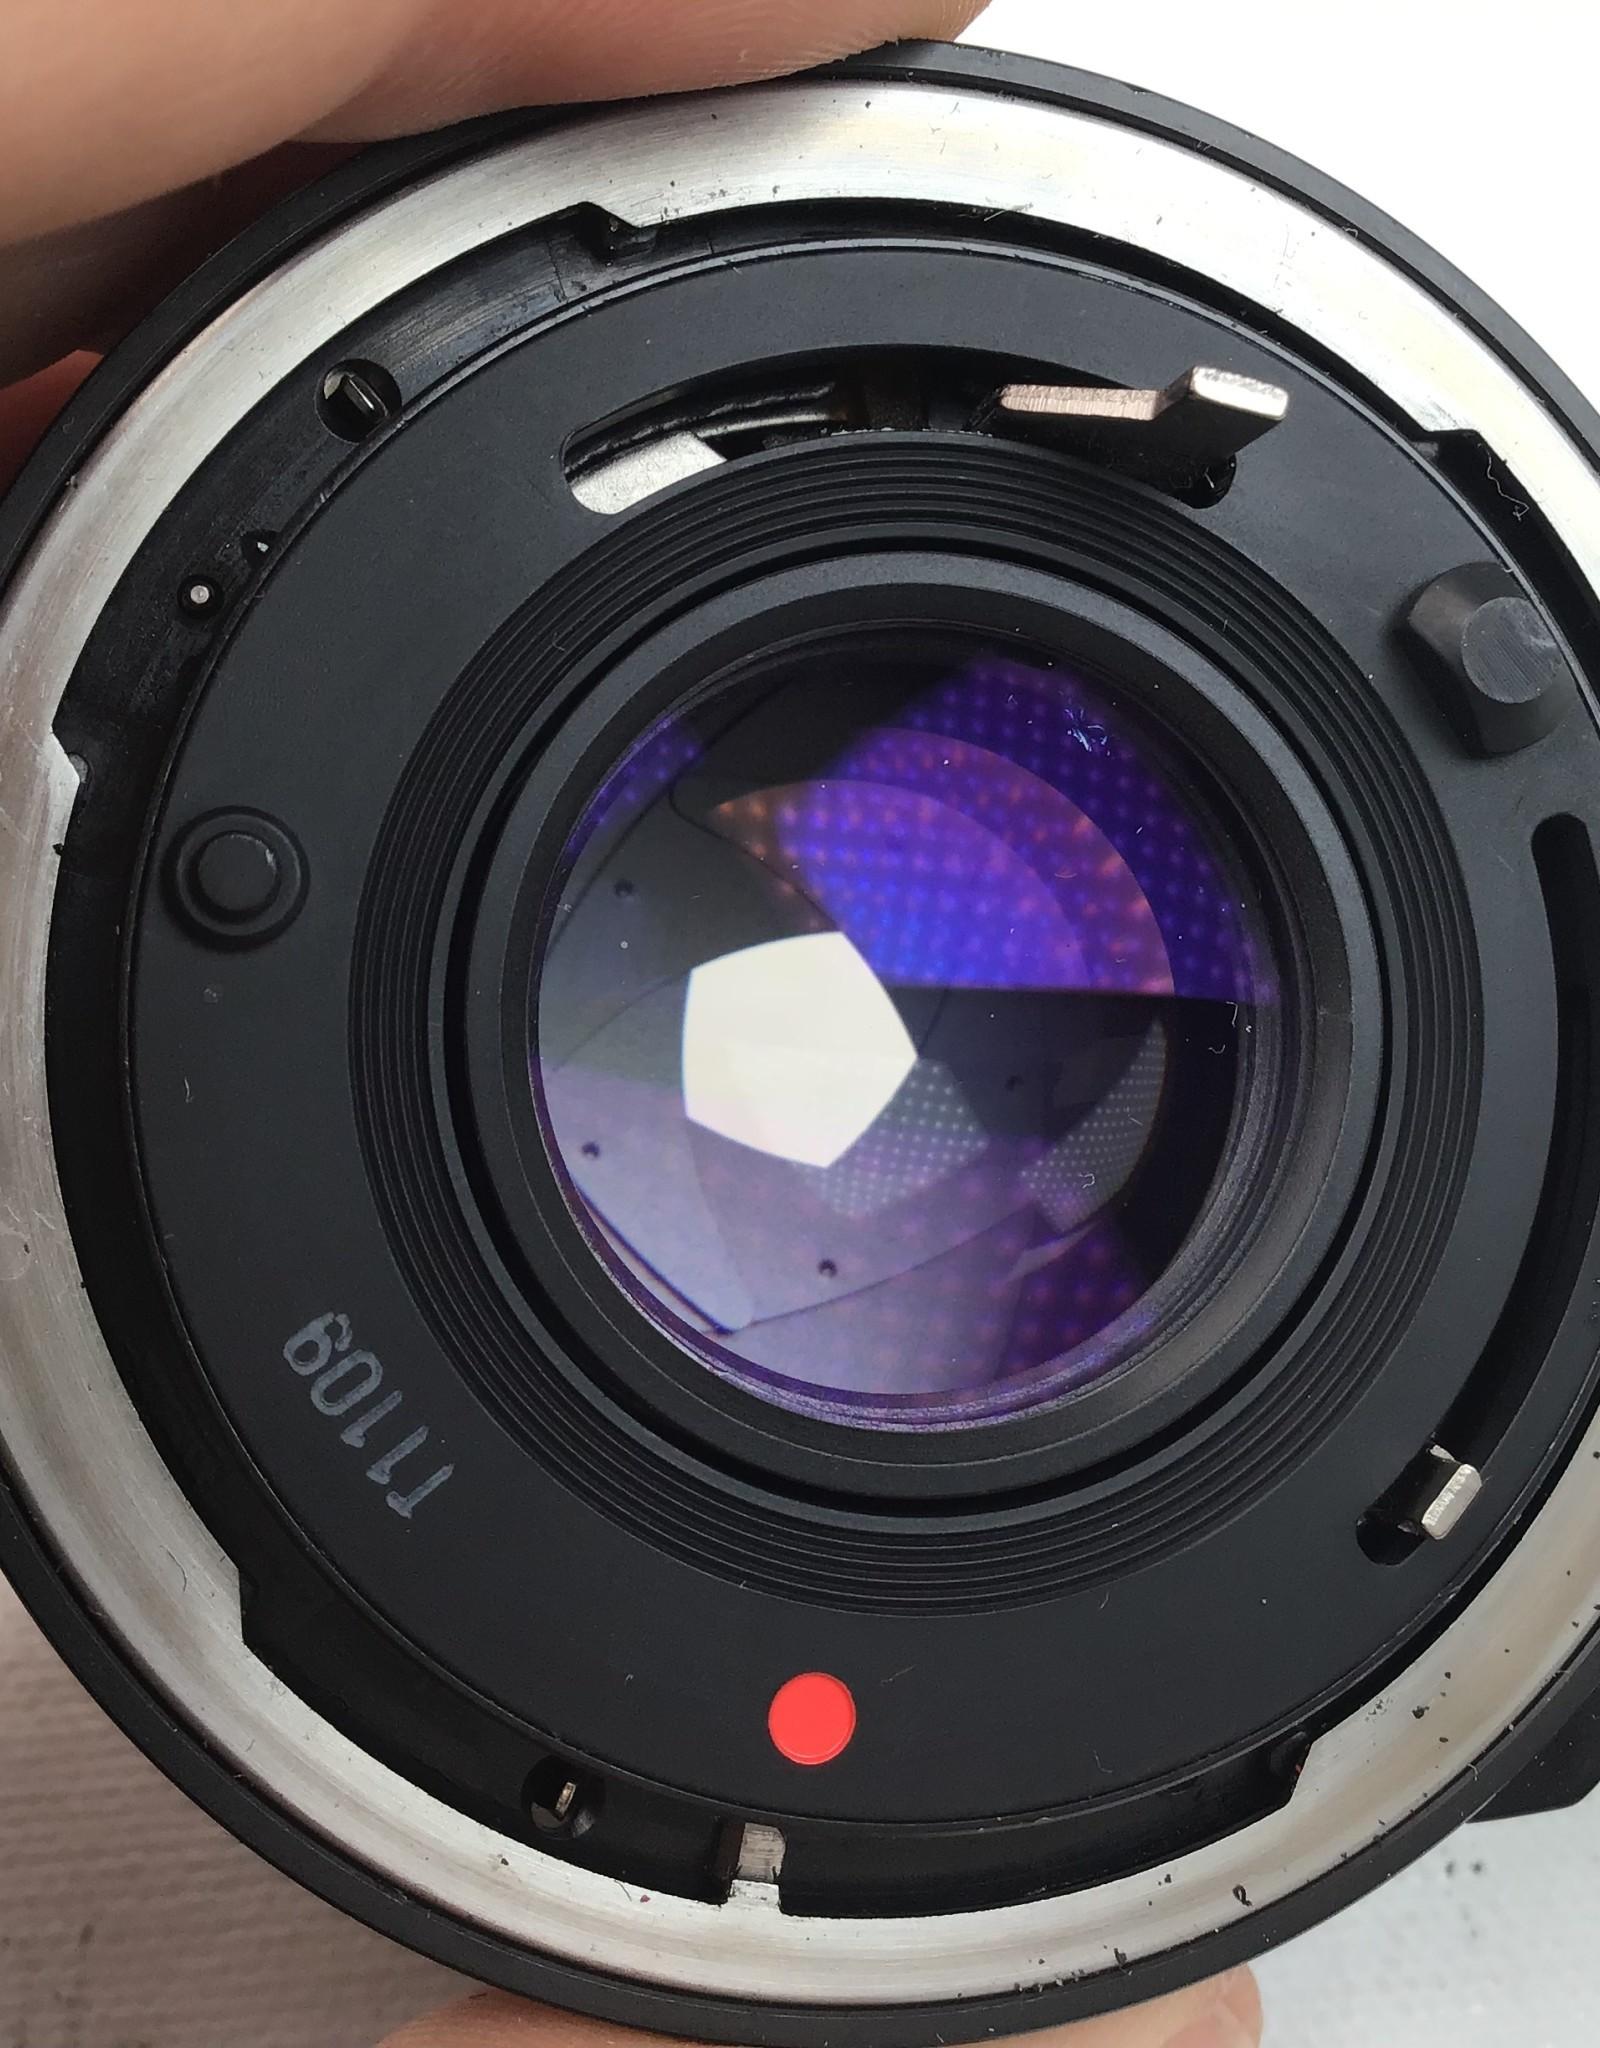 CANON Canon FD 50mm f1.8 Lens in Box Used EX